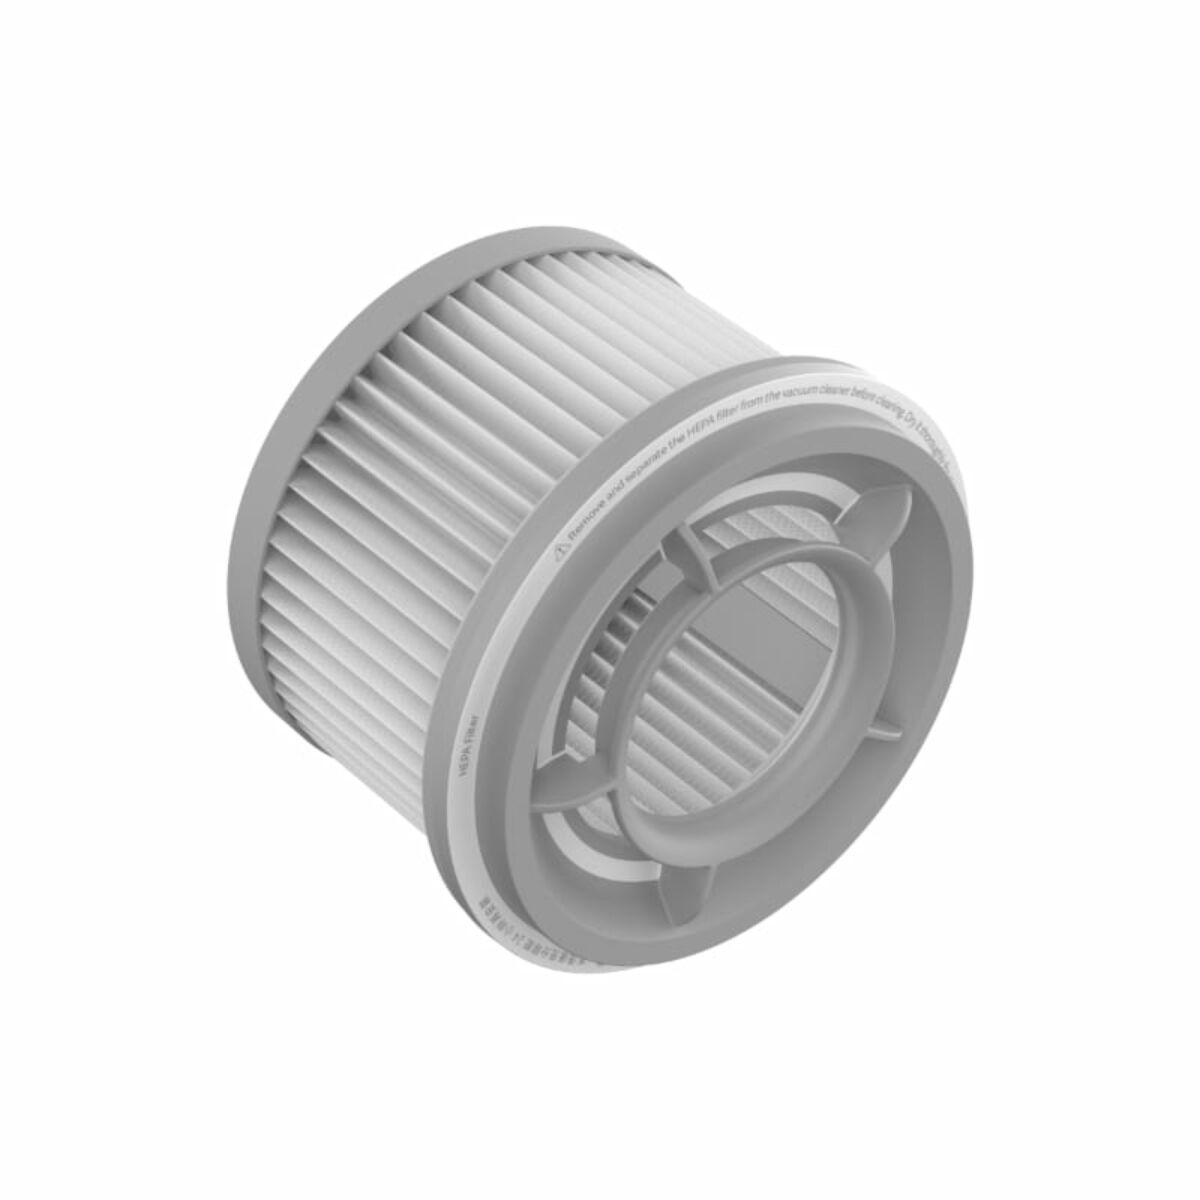 Xiaomi Vacuum Cleaner Mi Handheld Cordless G10 - HEPA filter EU